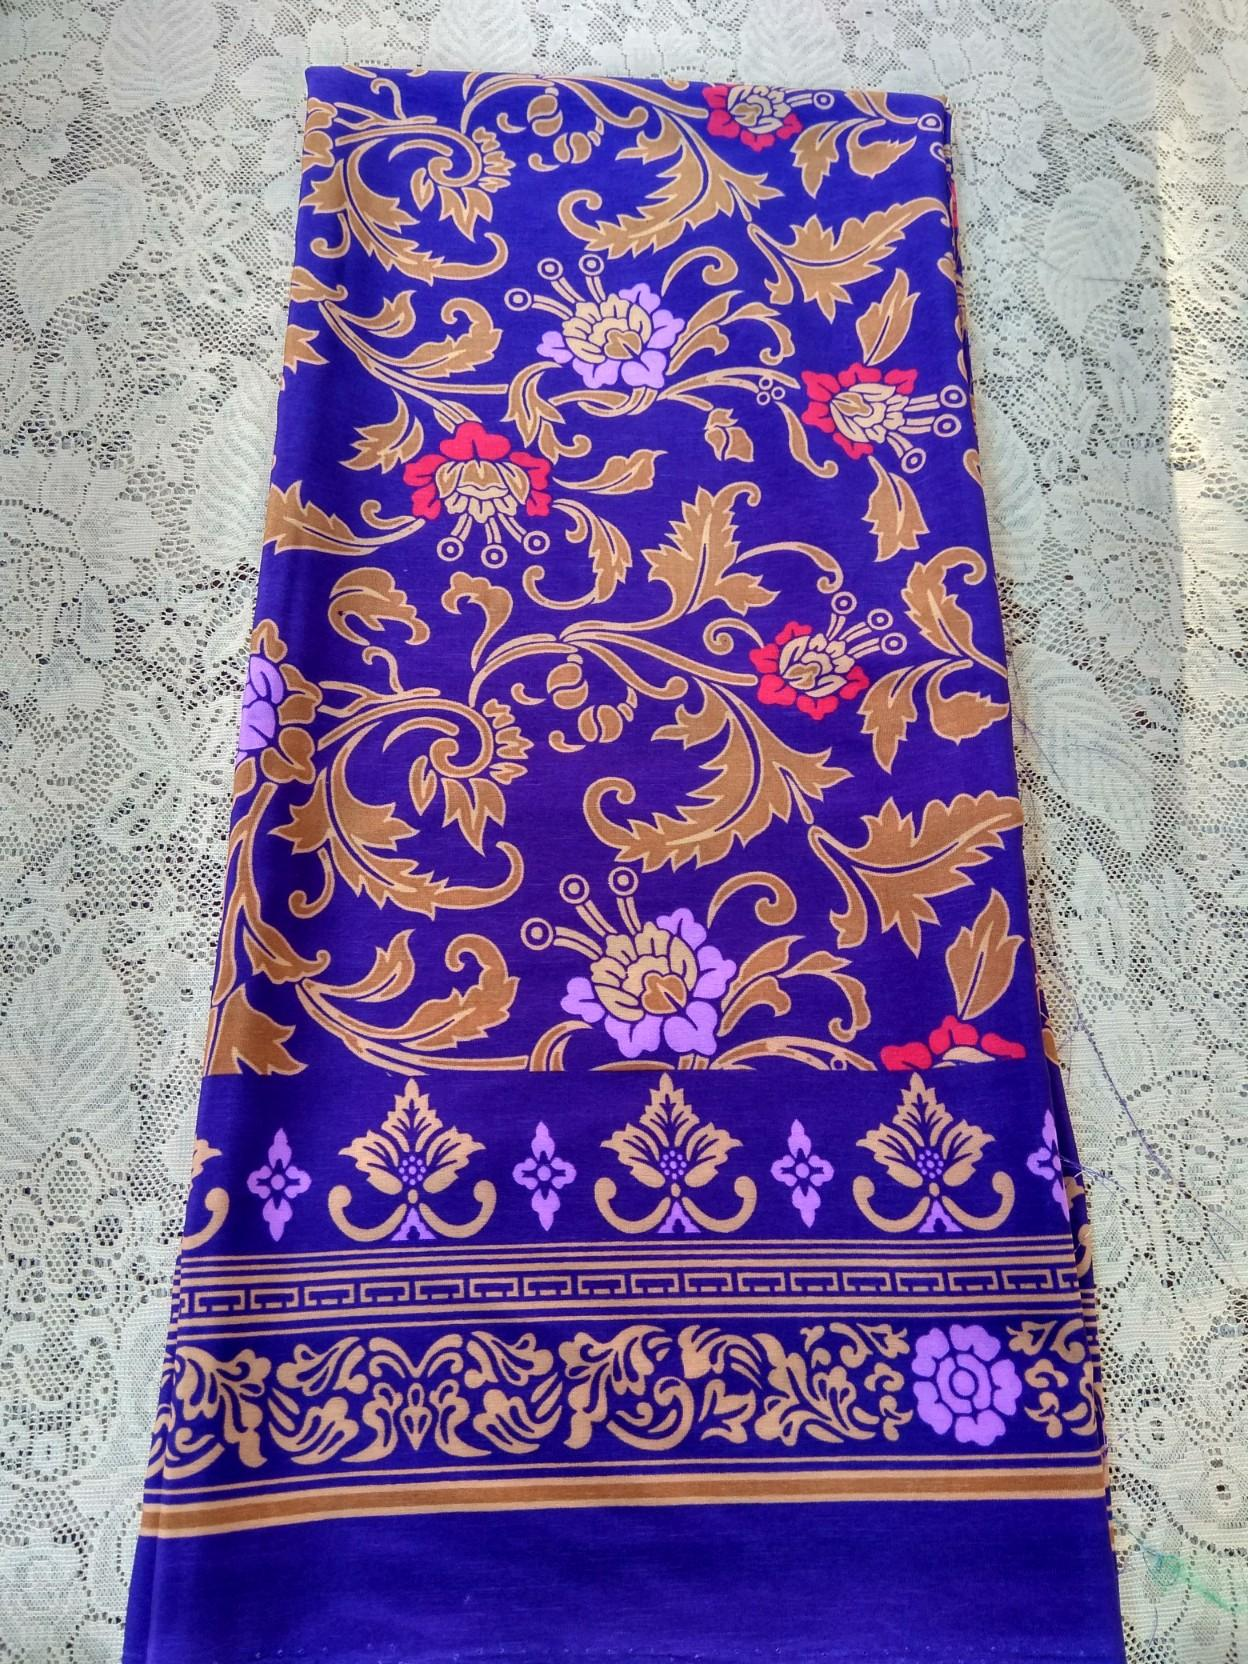 kanaya - kain satin batik mawar rambat lembaran uk. 2 meter kain tradisional bali kain murah